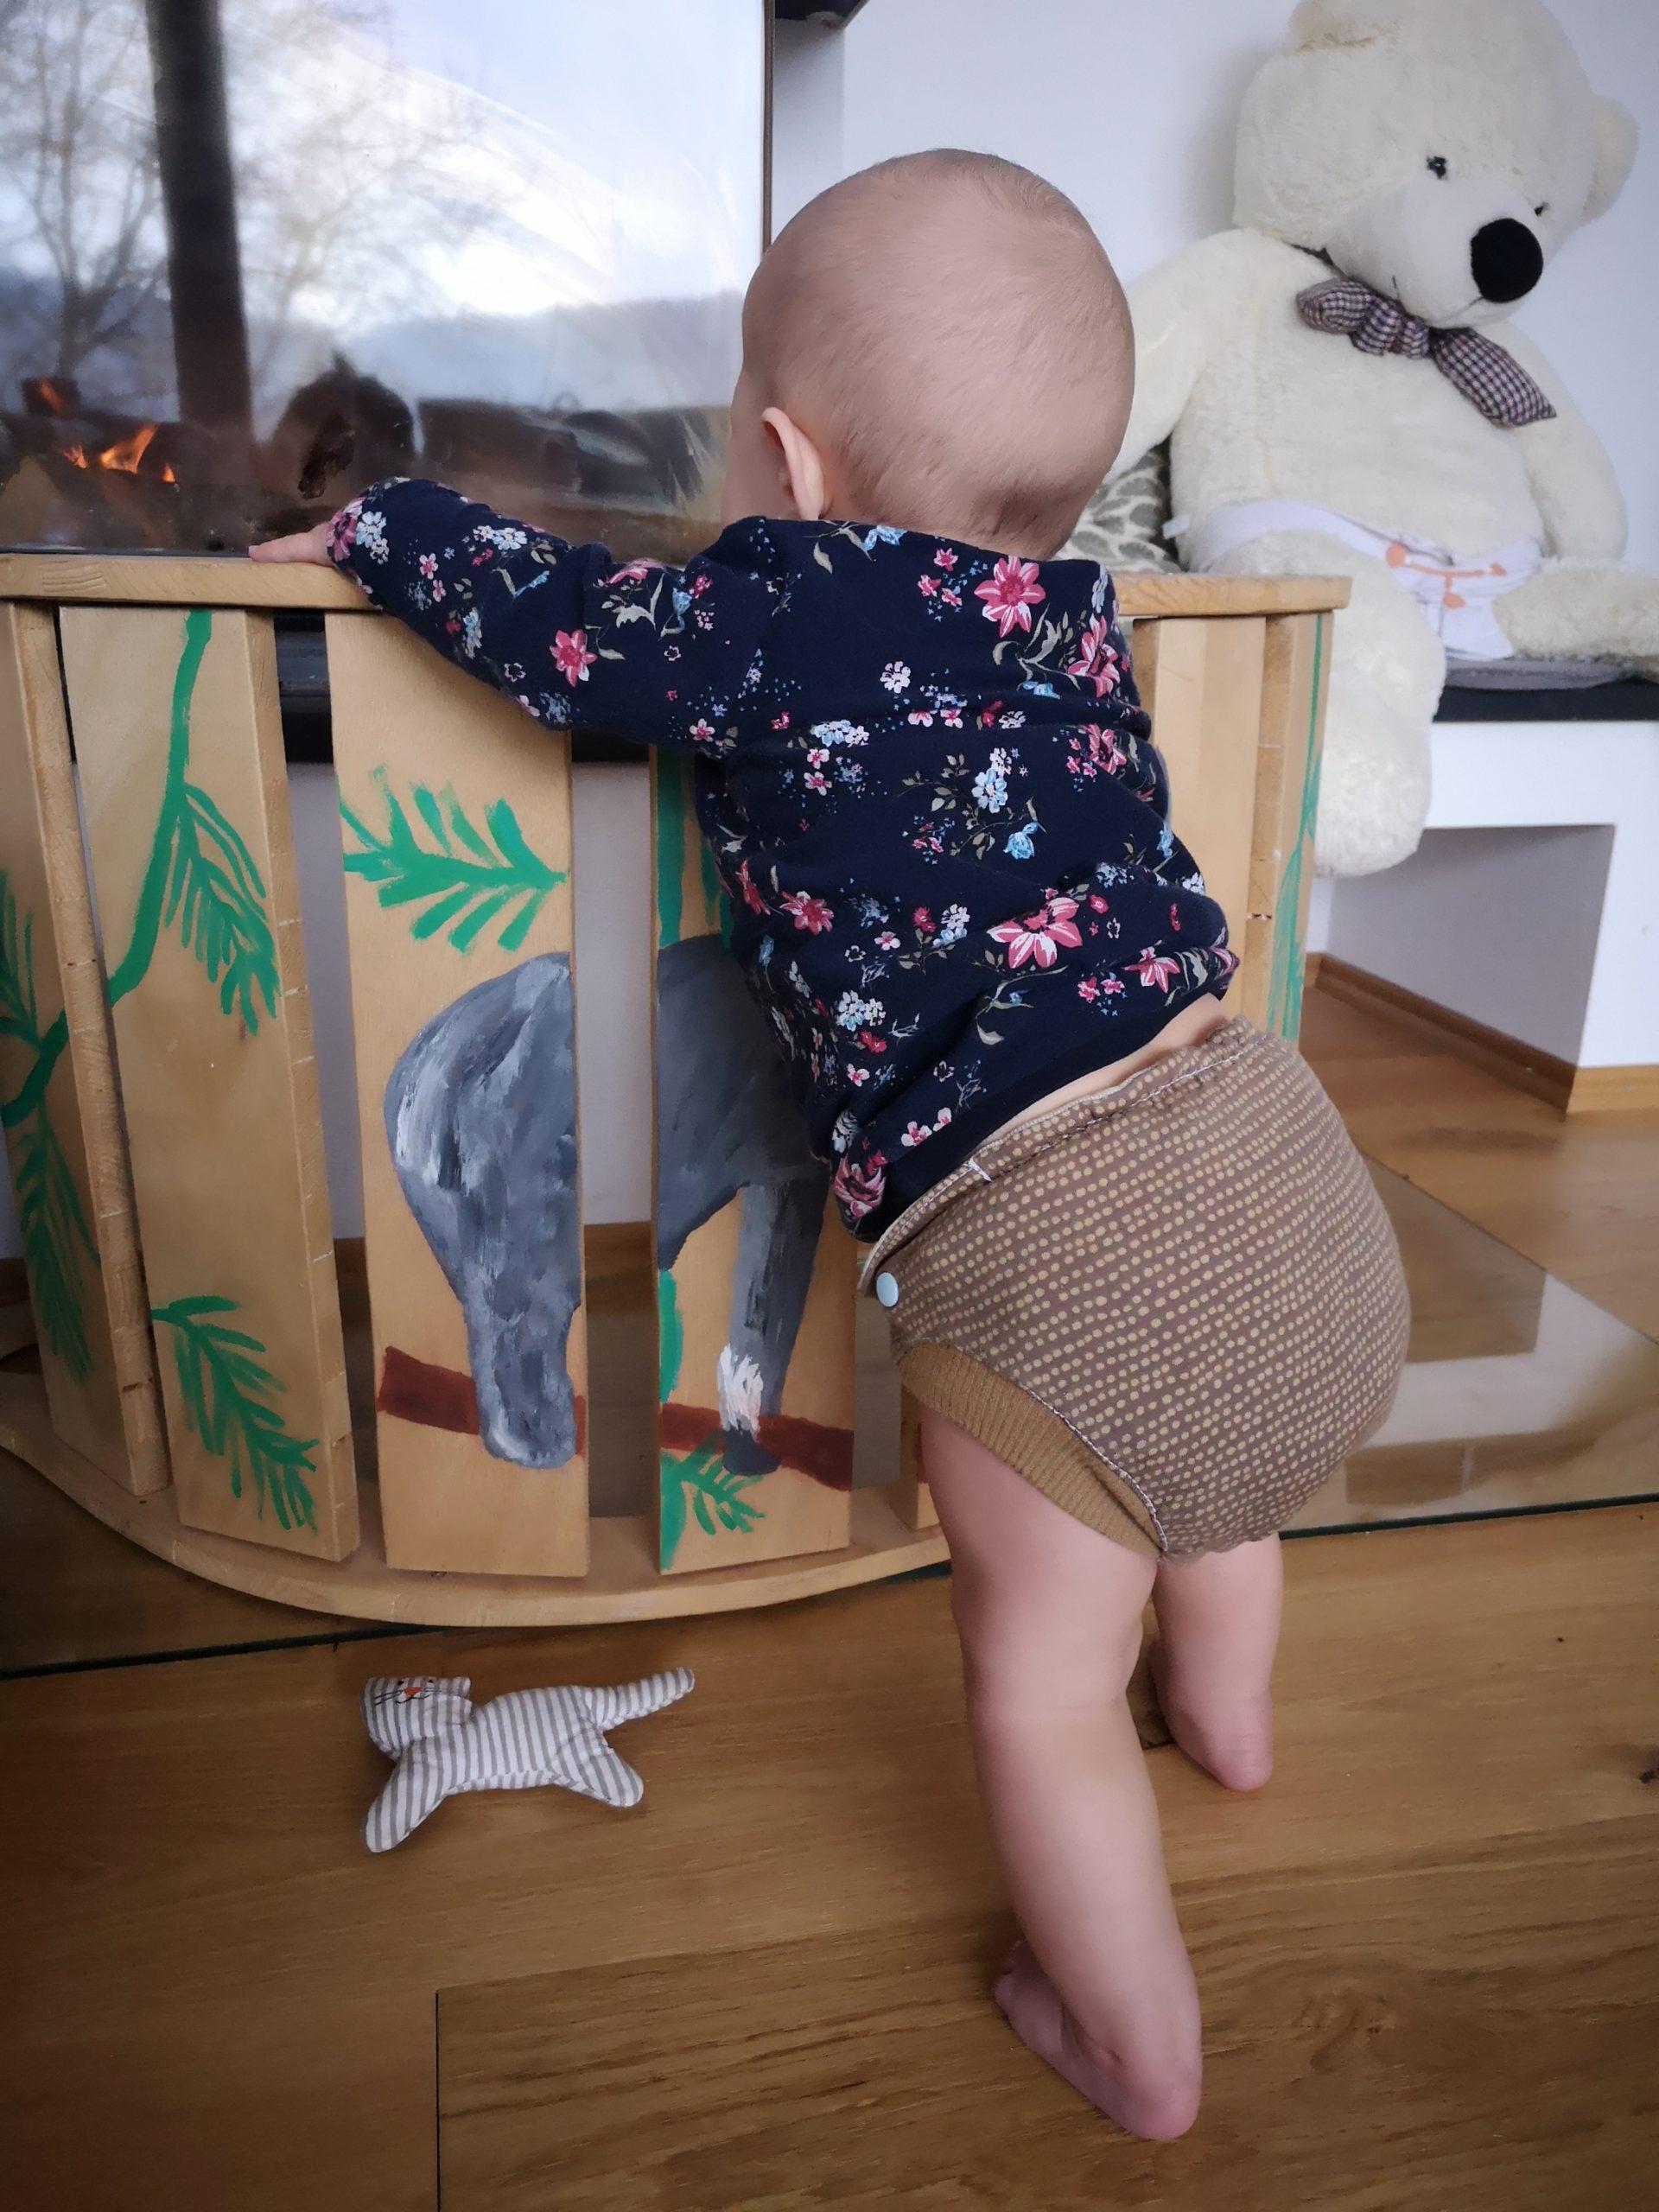 Windeln meine tochter trägt Tochter möchte